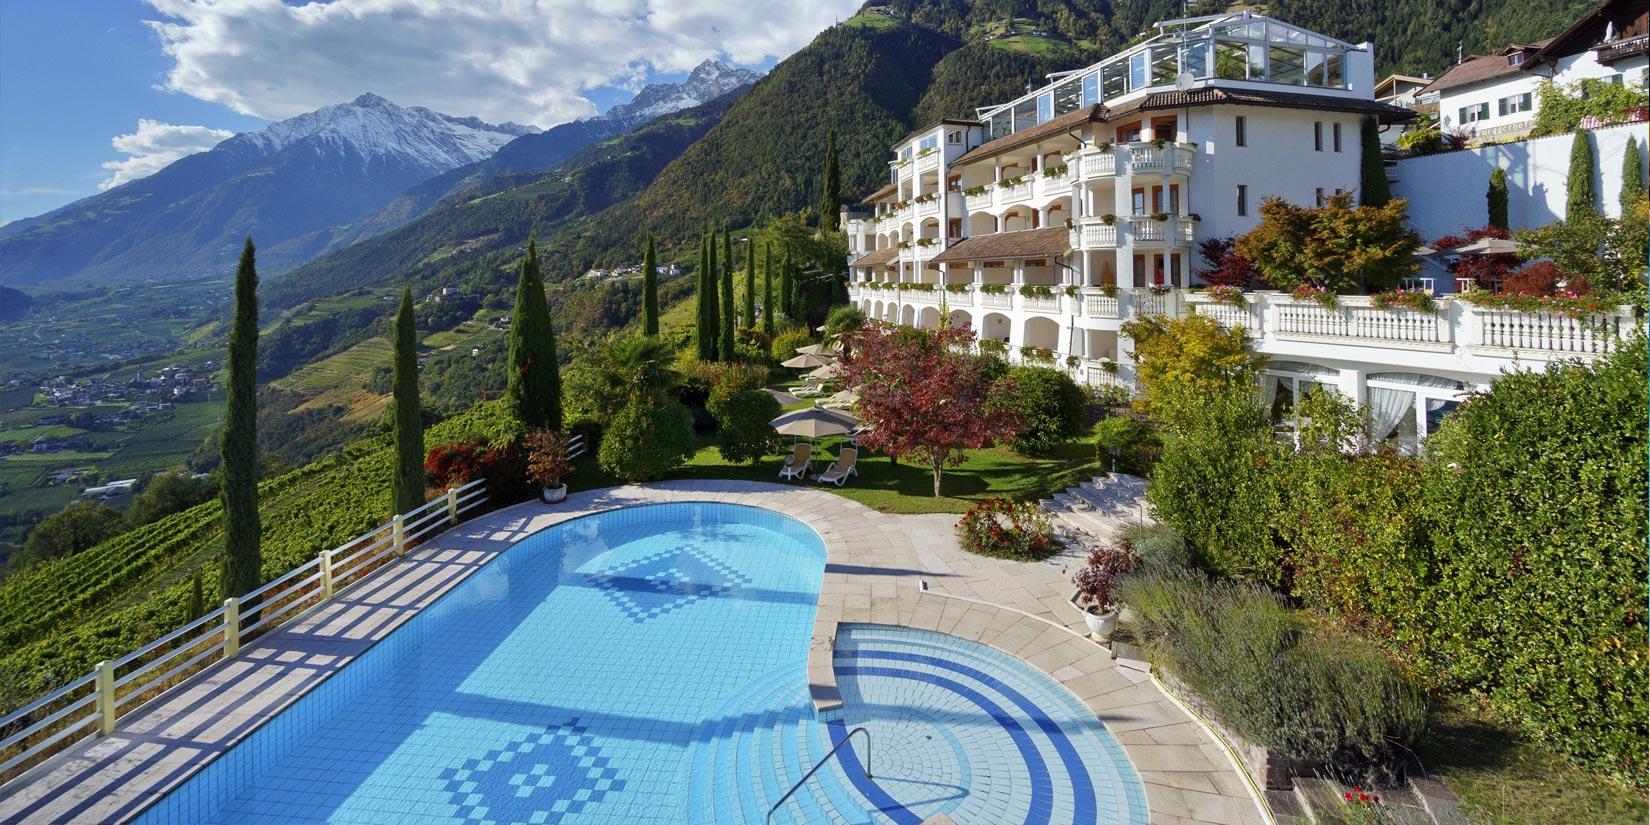 Hotel dorf tirol 4 sterne superior hotel bei meran for Designhotel dorf tirol